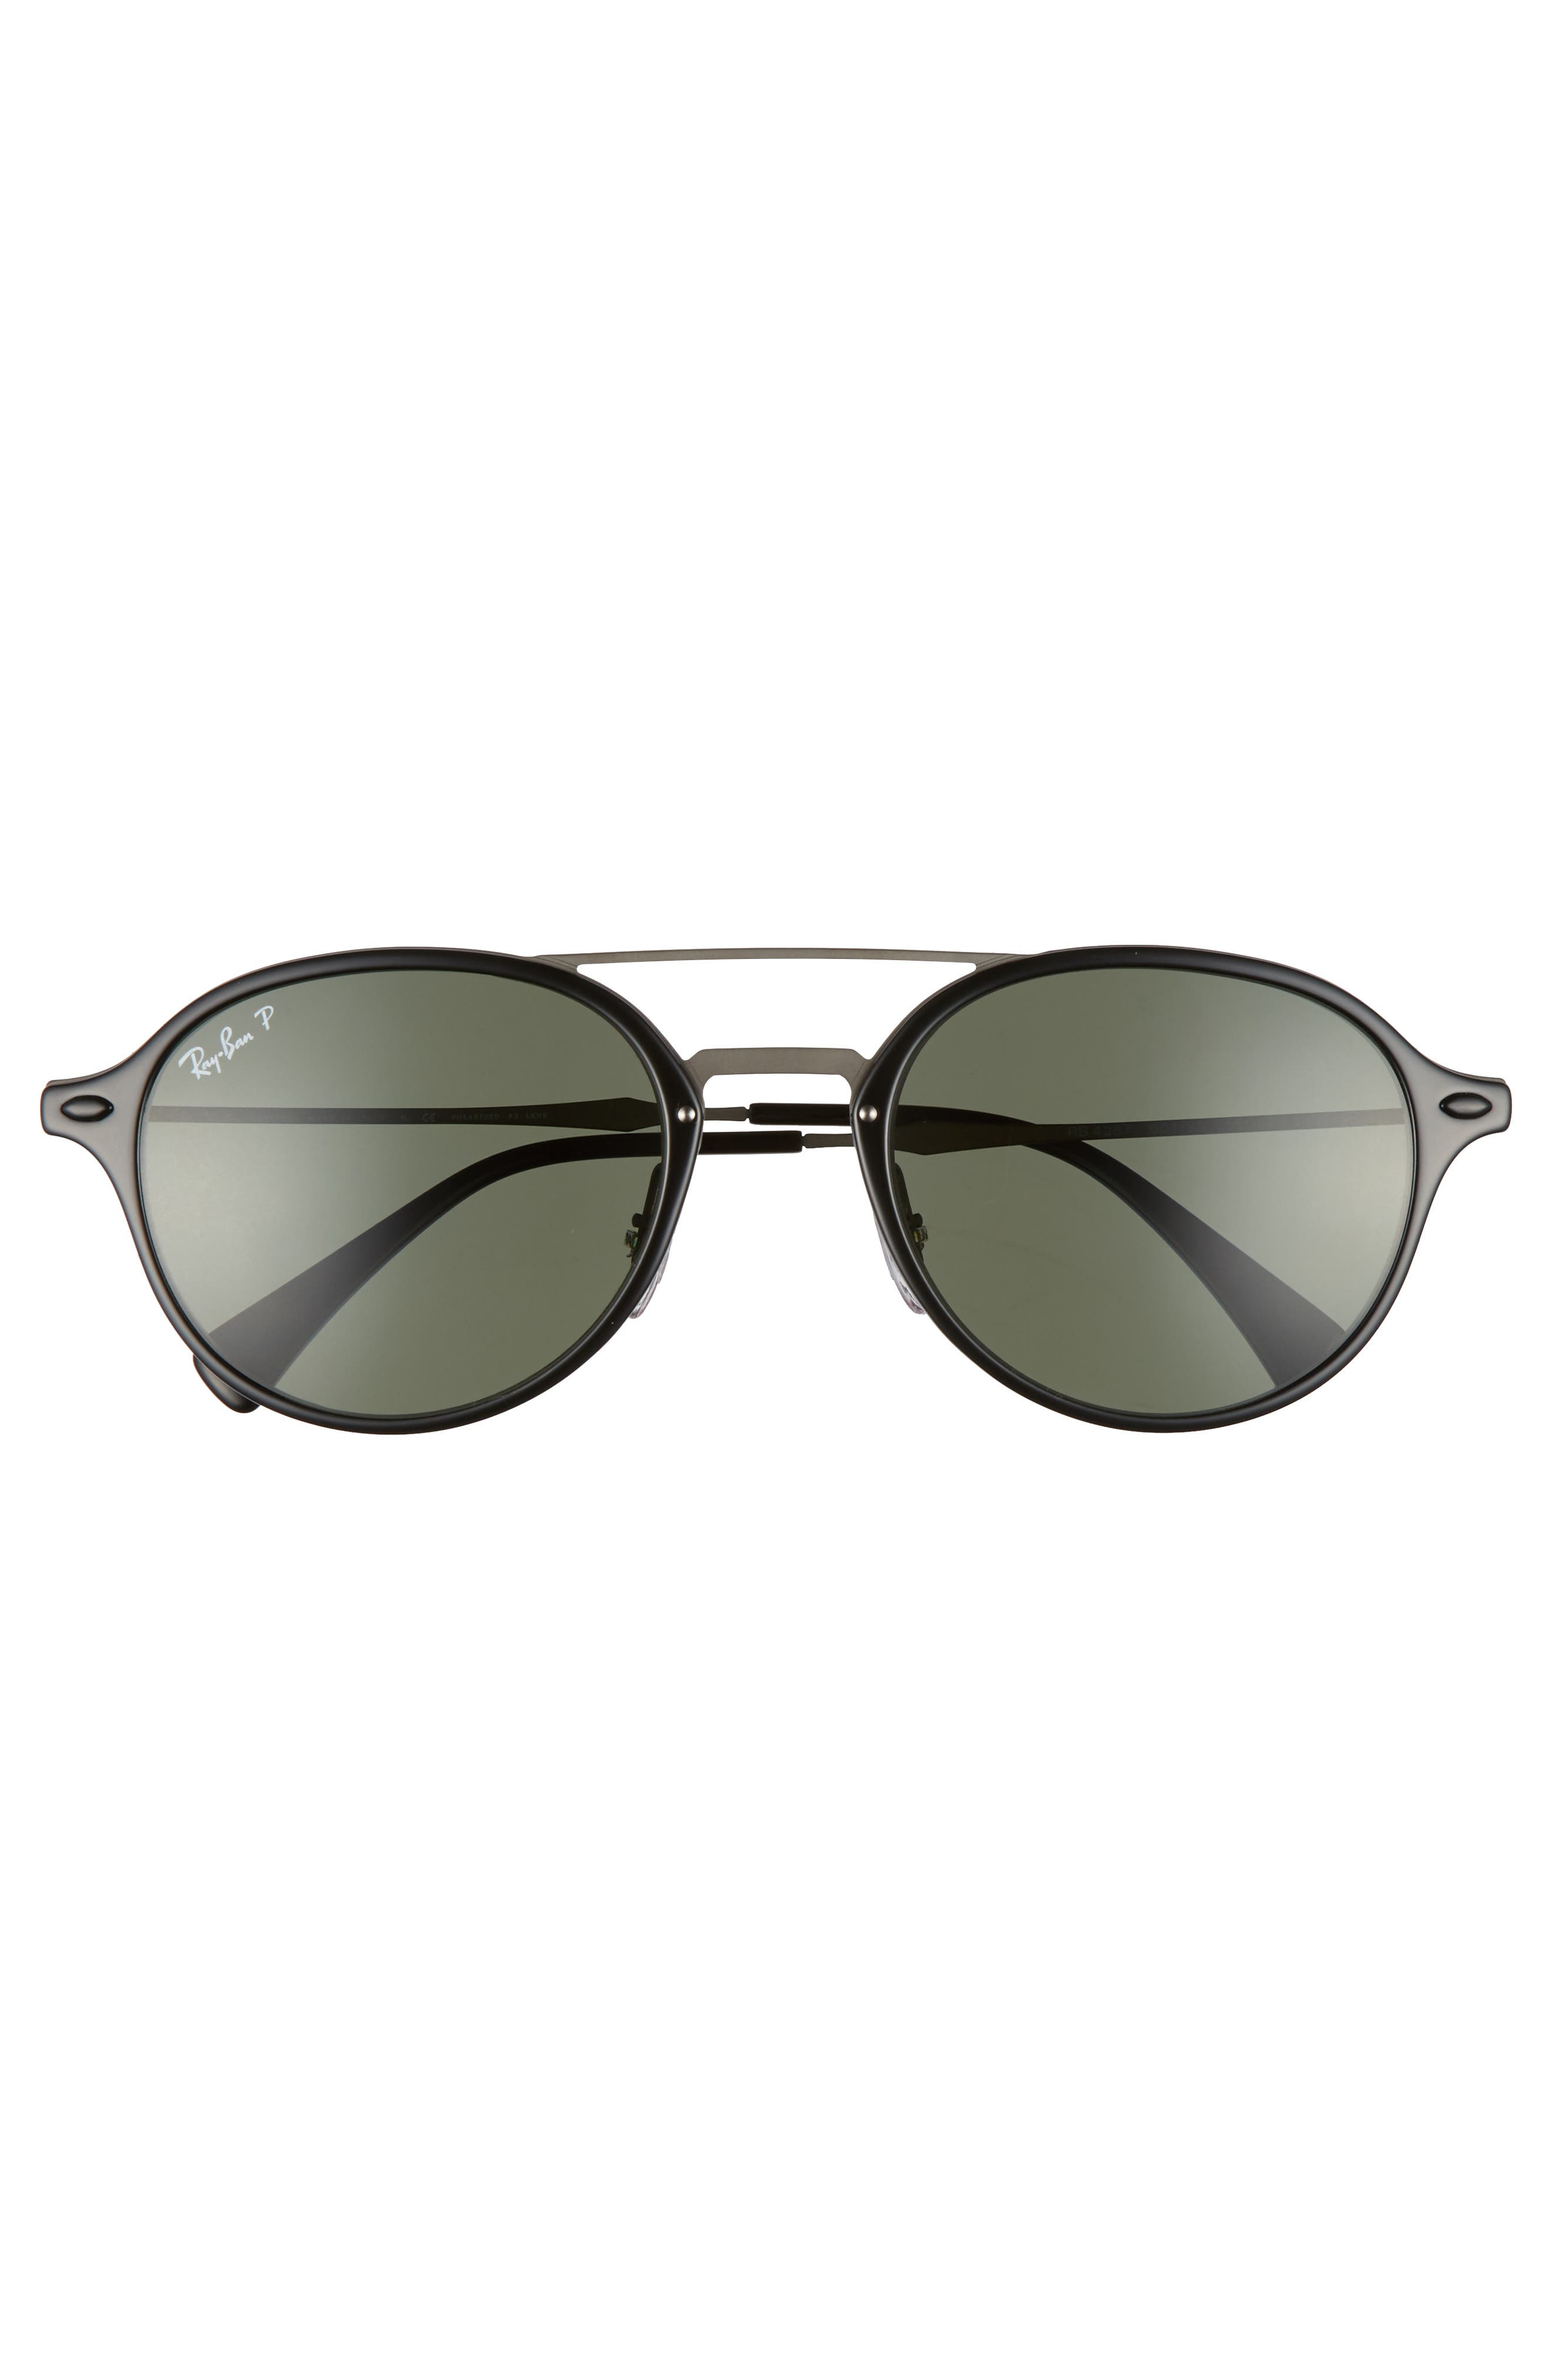 55mm Aviator Sunglasses,                             Alternate thumbnail 3, color,                             001